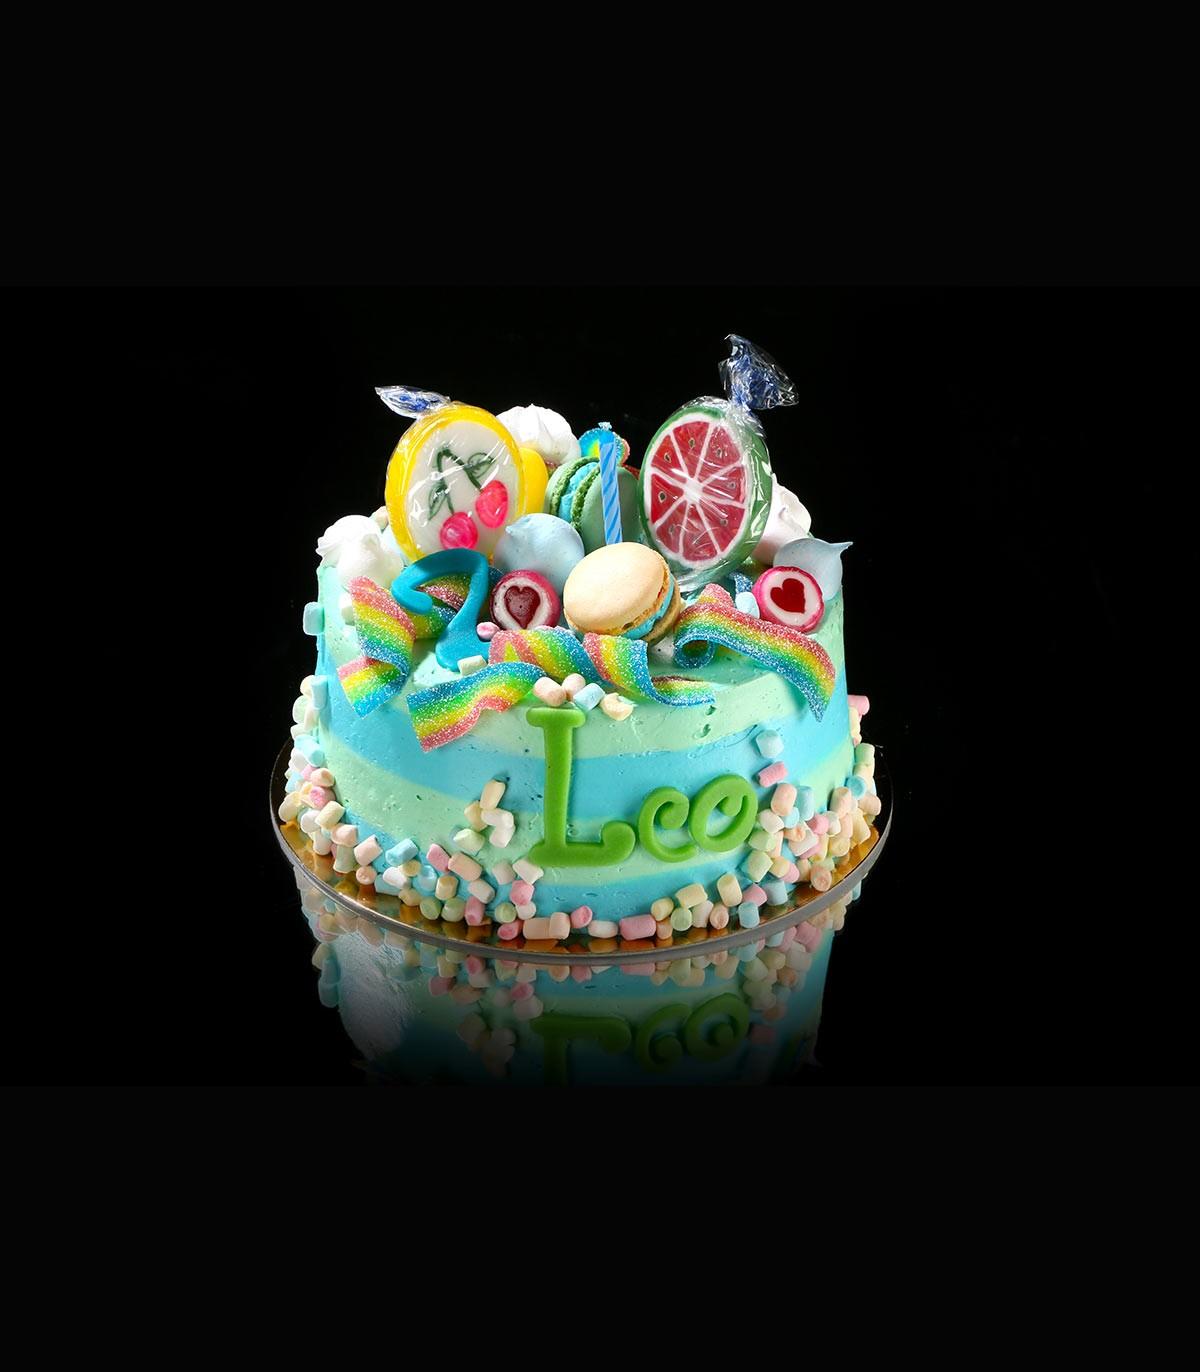 Kinder Geburtstagstorte Creme ø 18 Cm Höhe 10 Cm